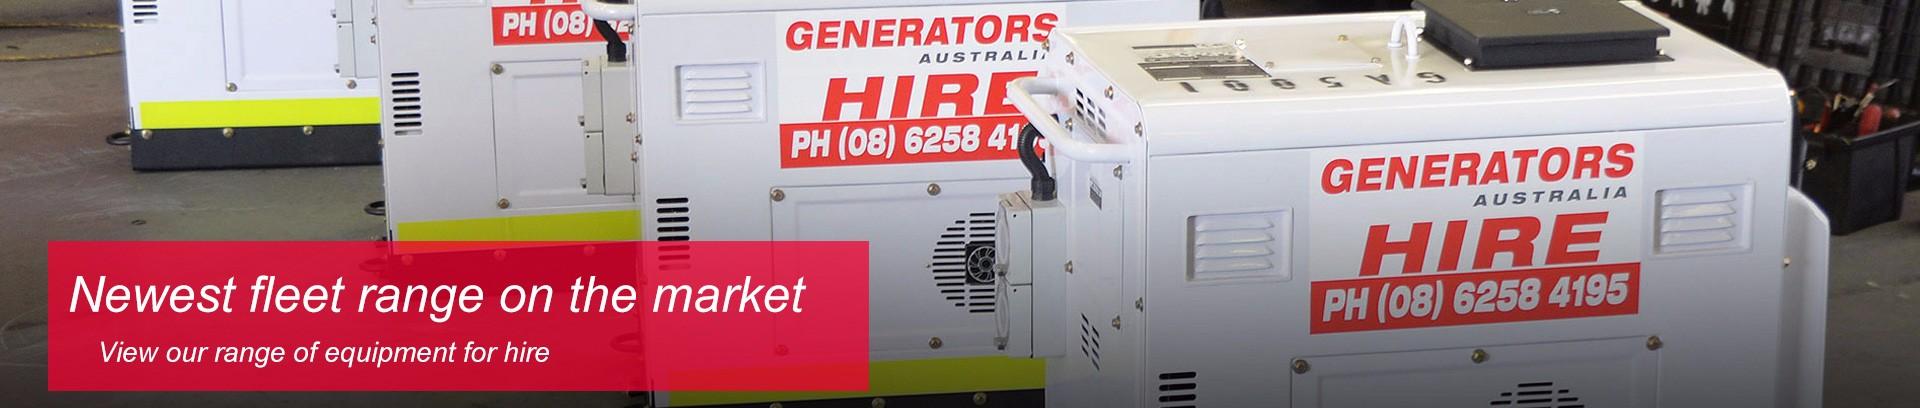 03-generators-australia-image-hire